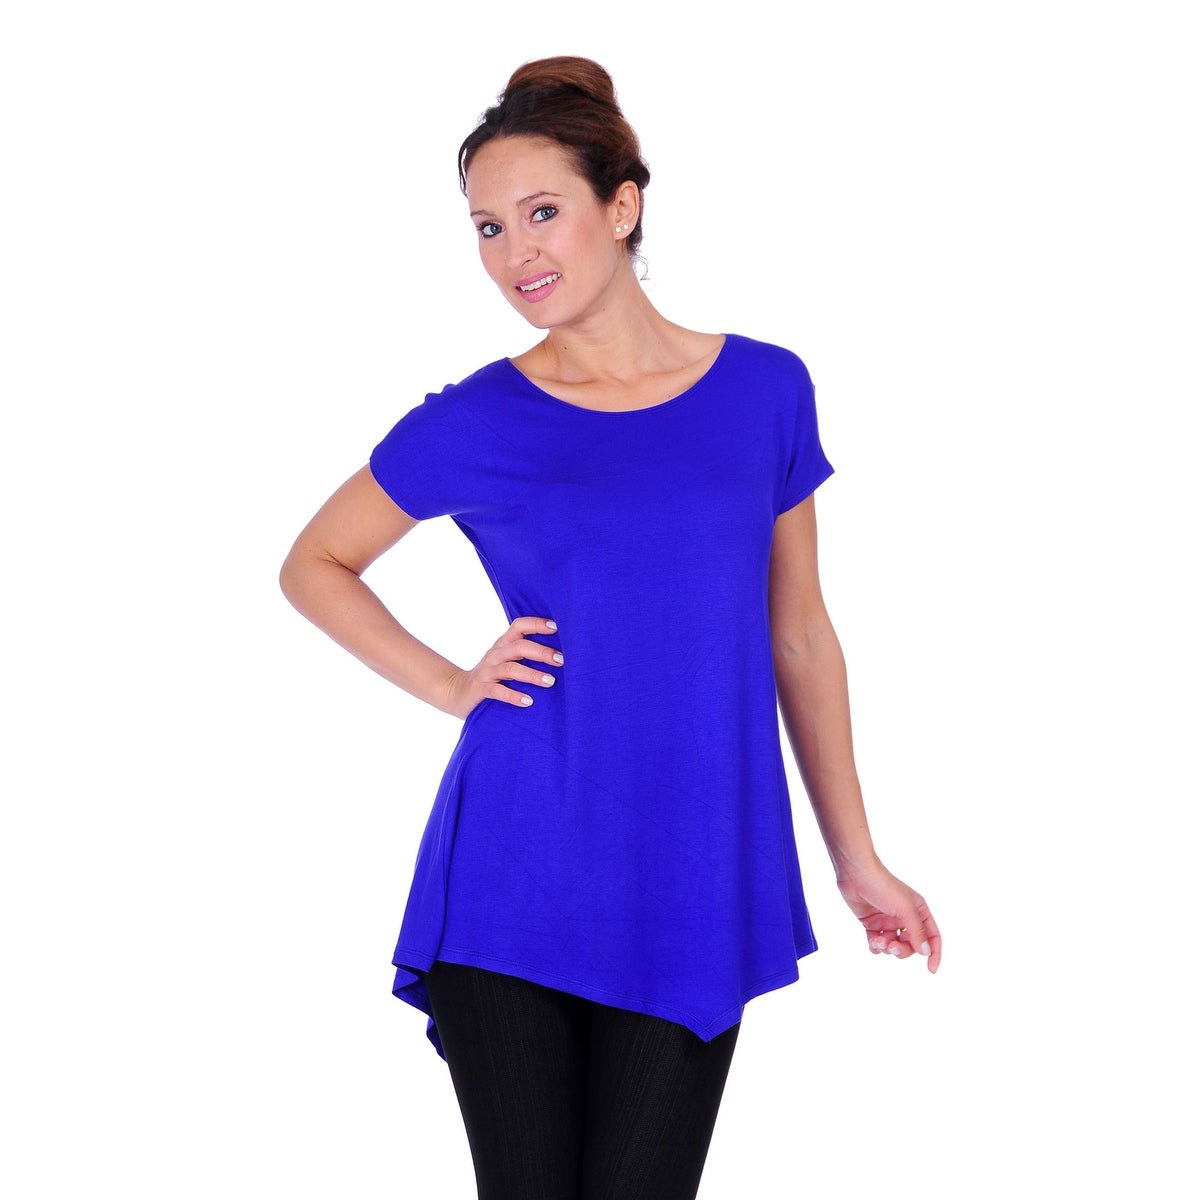 Simply Ravishing Women's Assymetrical Front/Back Handkerchief Hem Sleeveless Tunic Top - Thumbnail 11